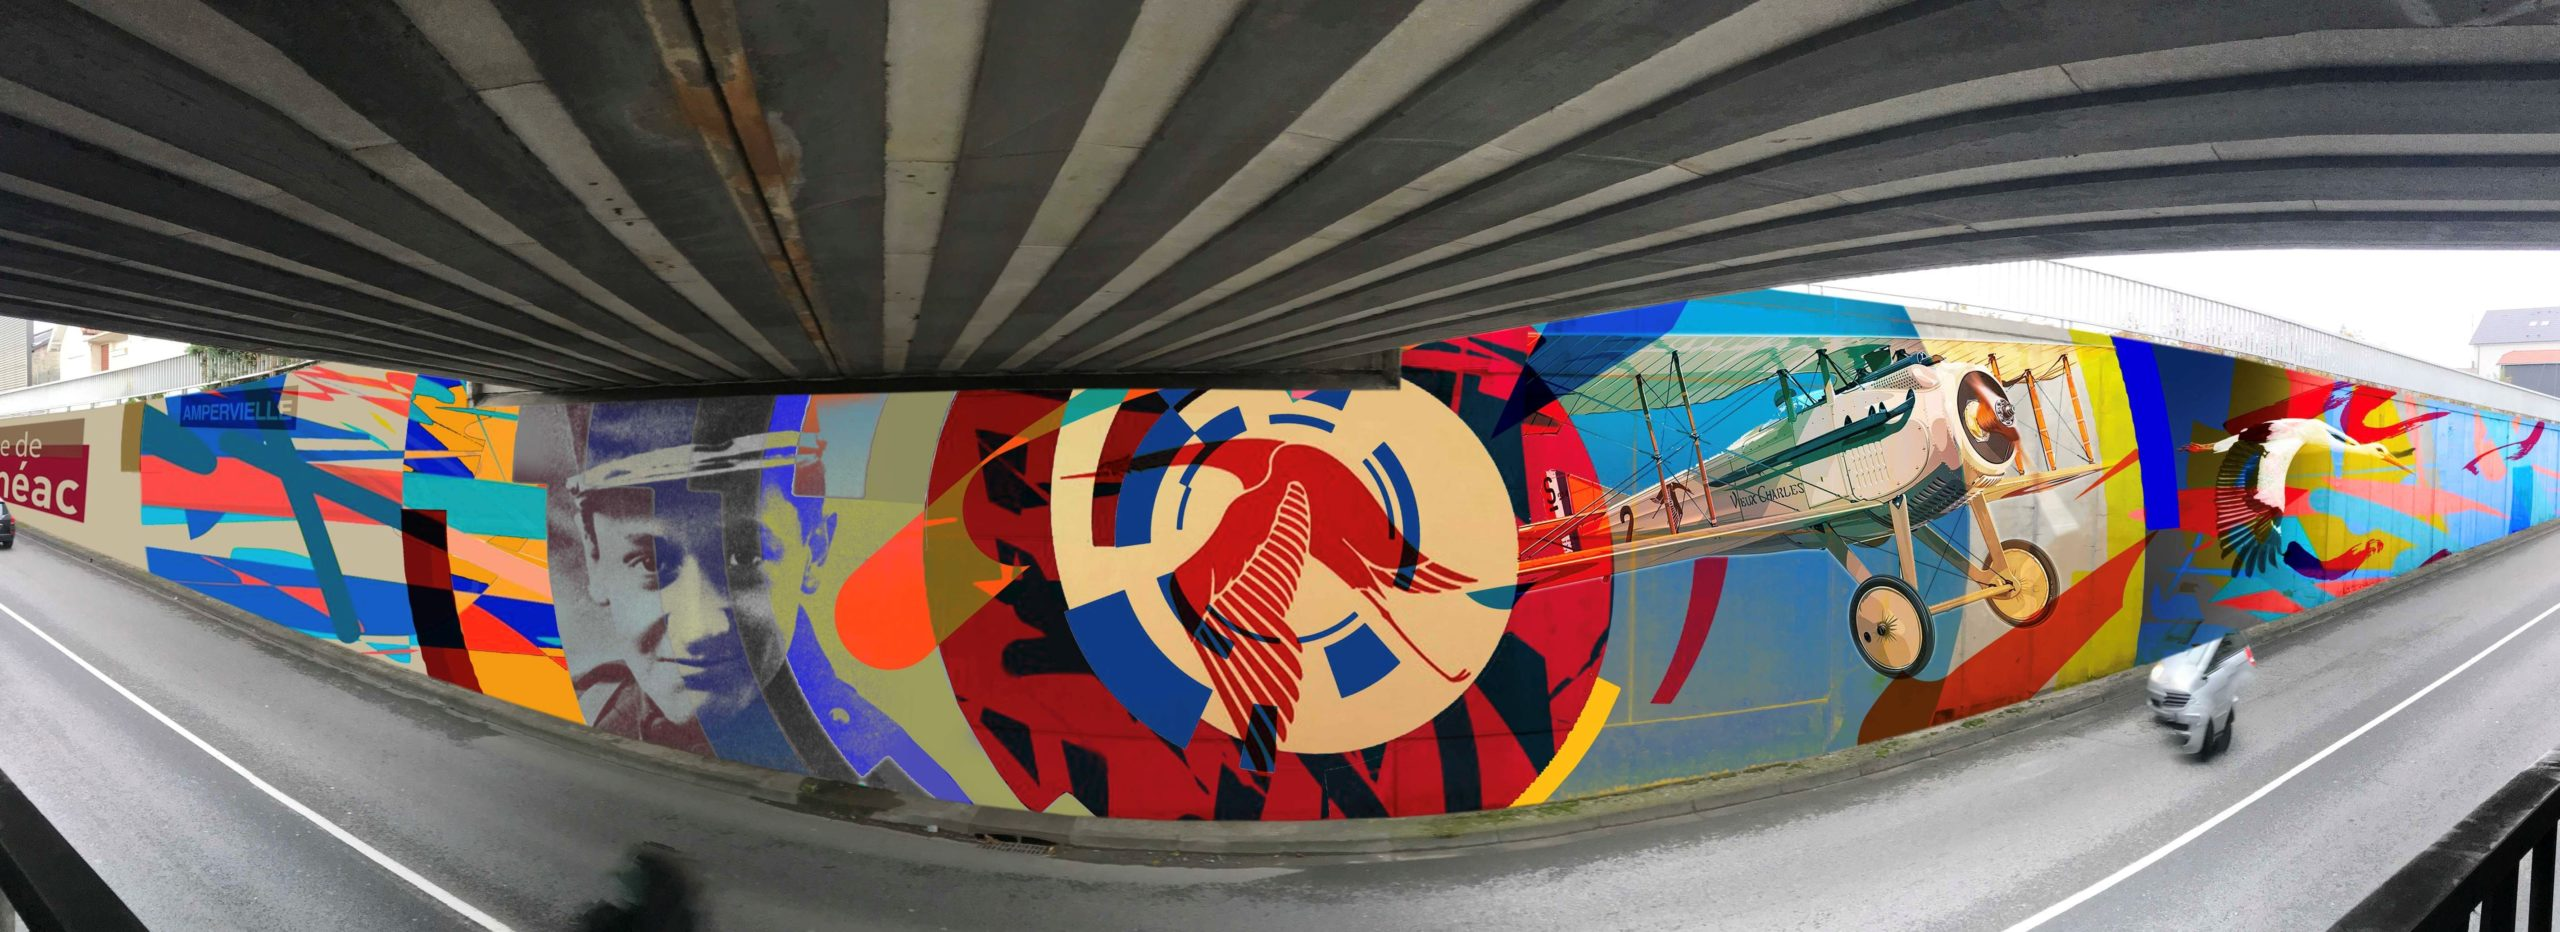 Ville de Semeac, Fresque Alstom